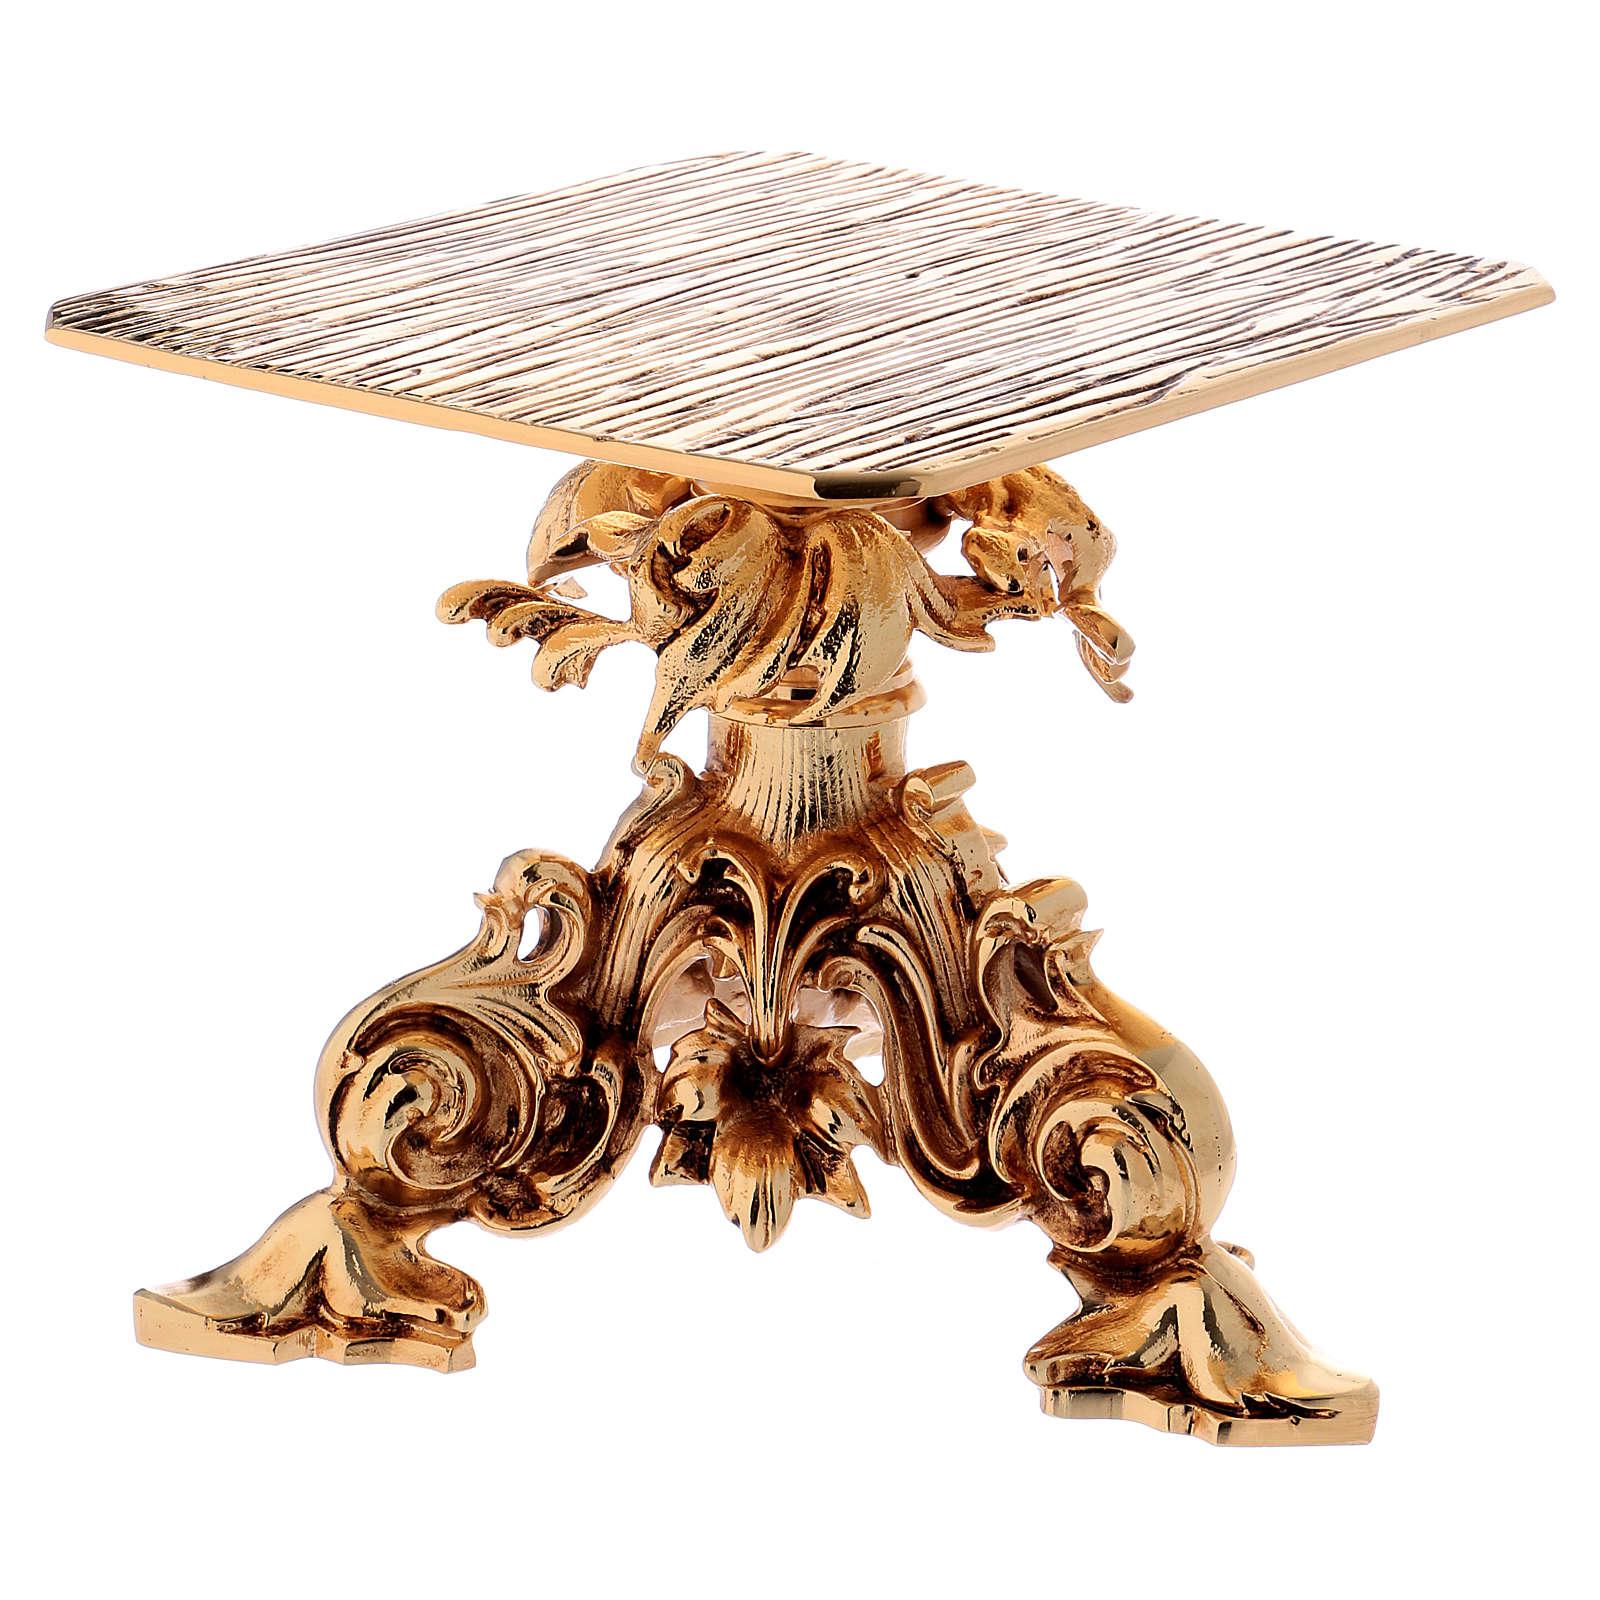 Trono de latón fundido dorado 24x22 cm 4